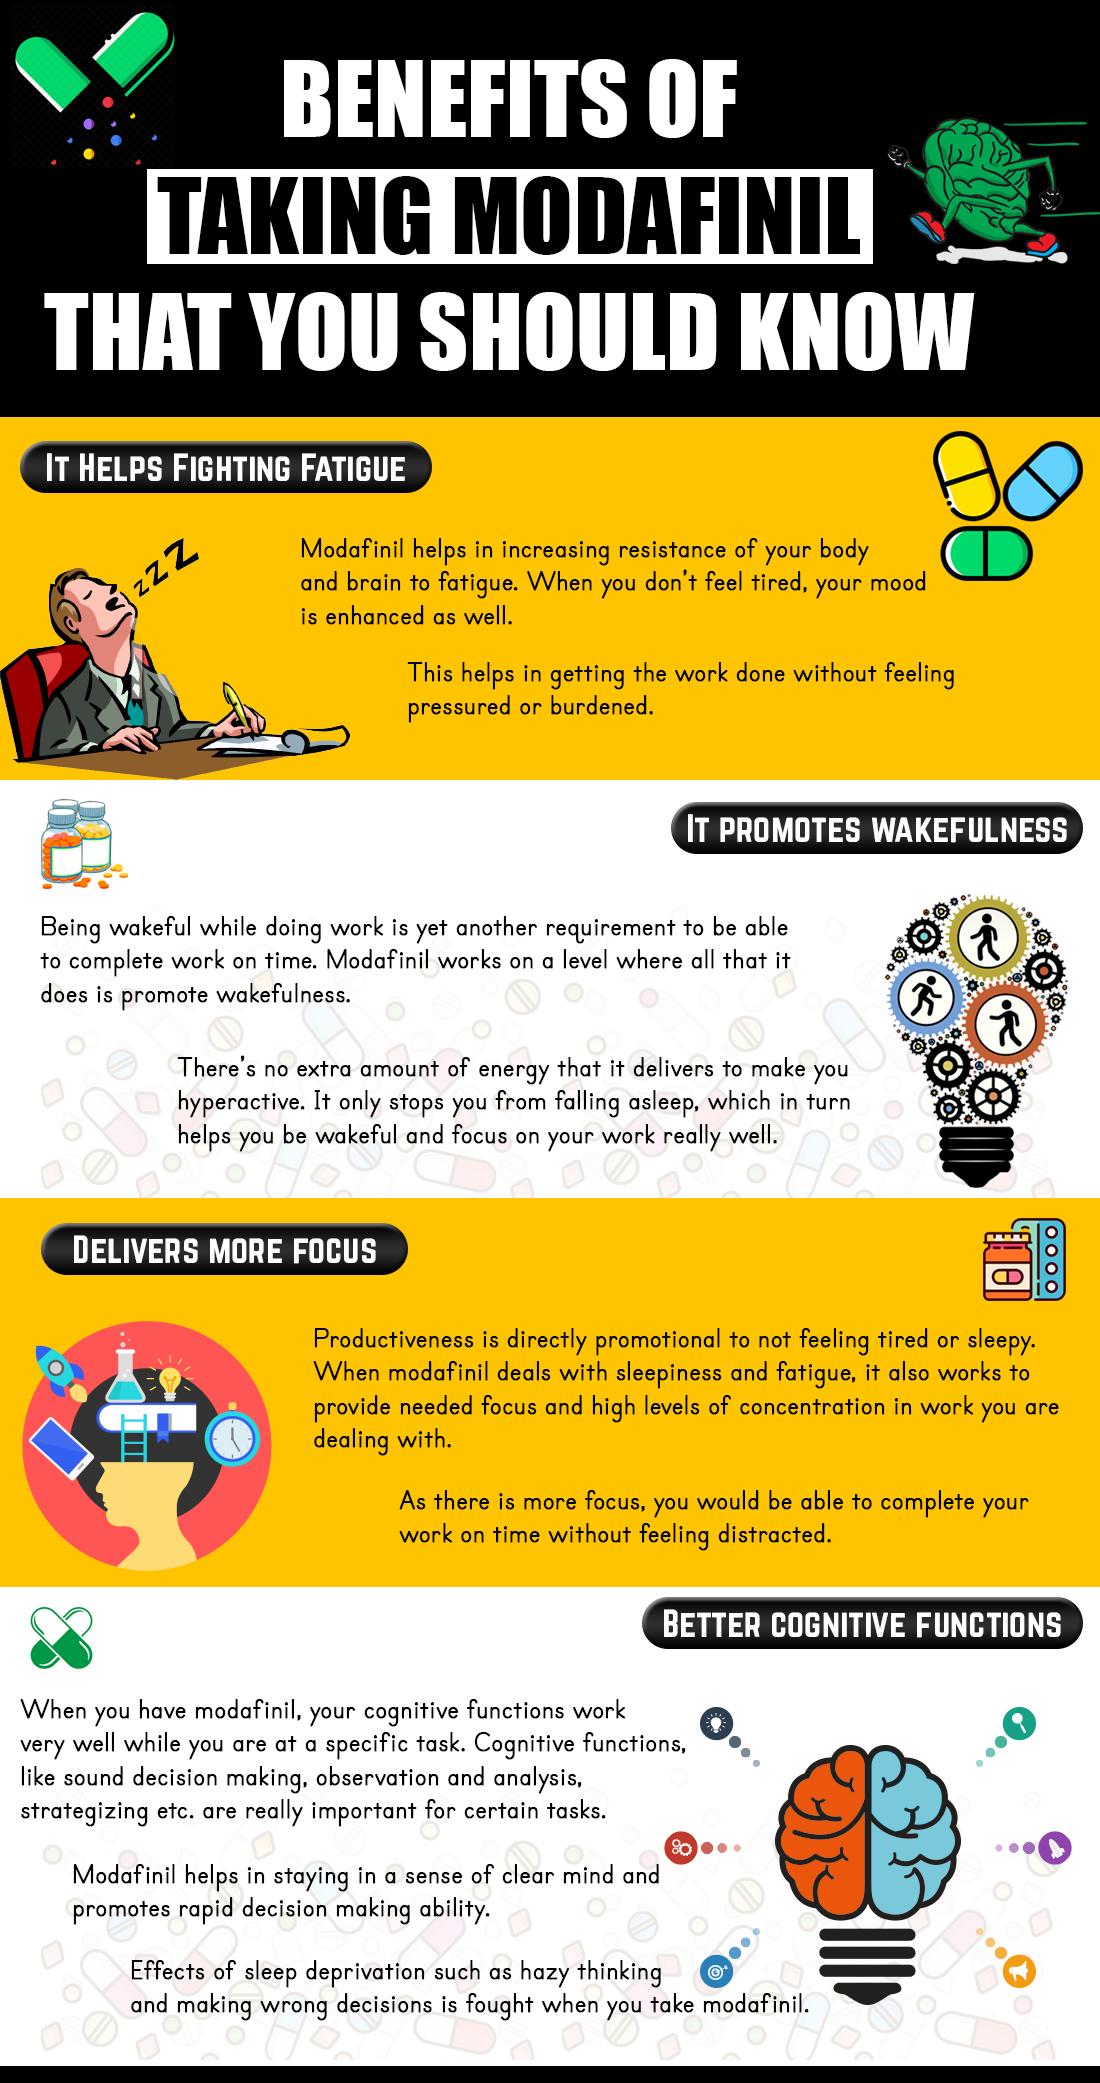 Benefits of taking modafinil